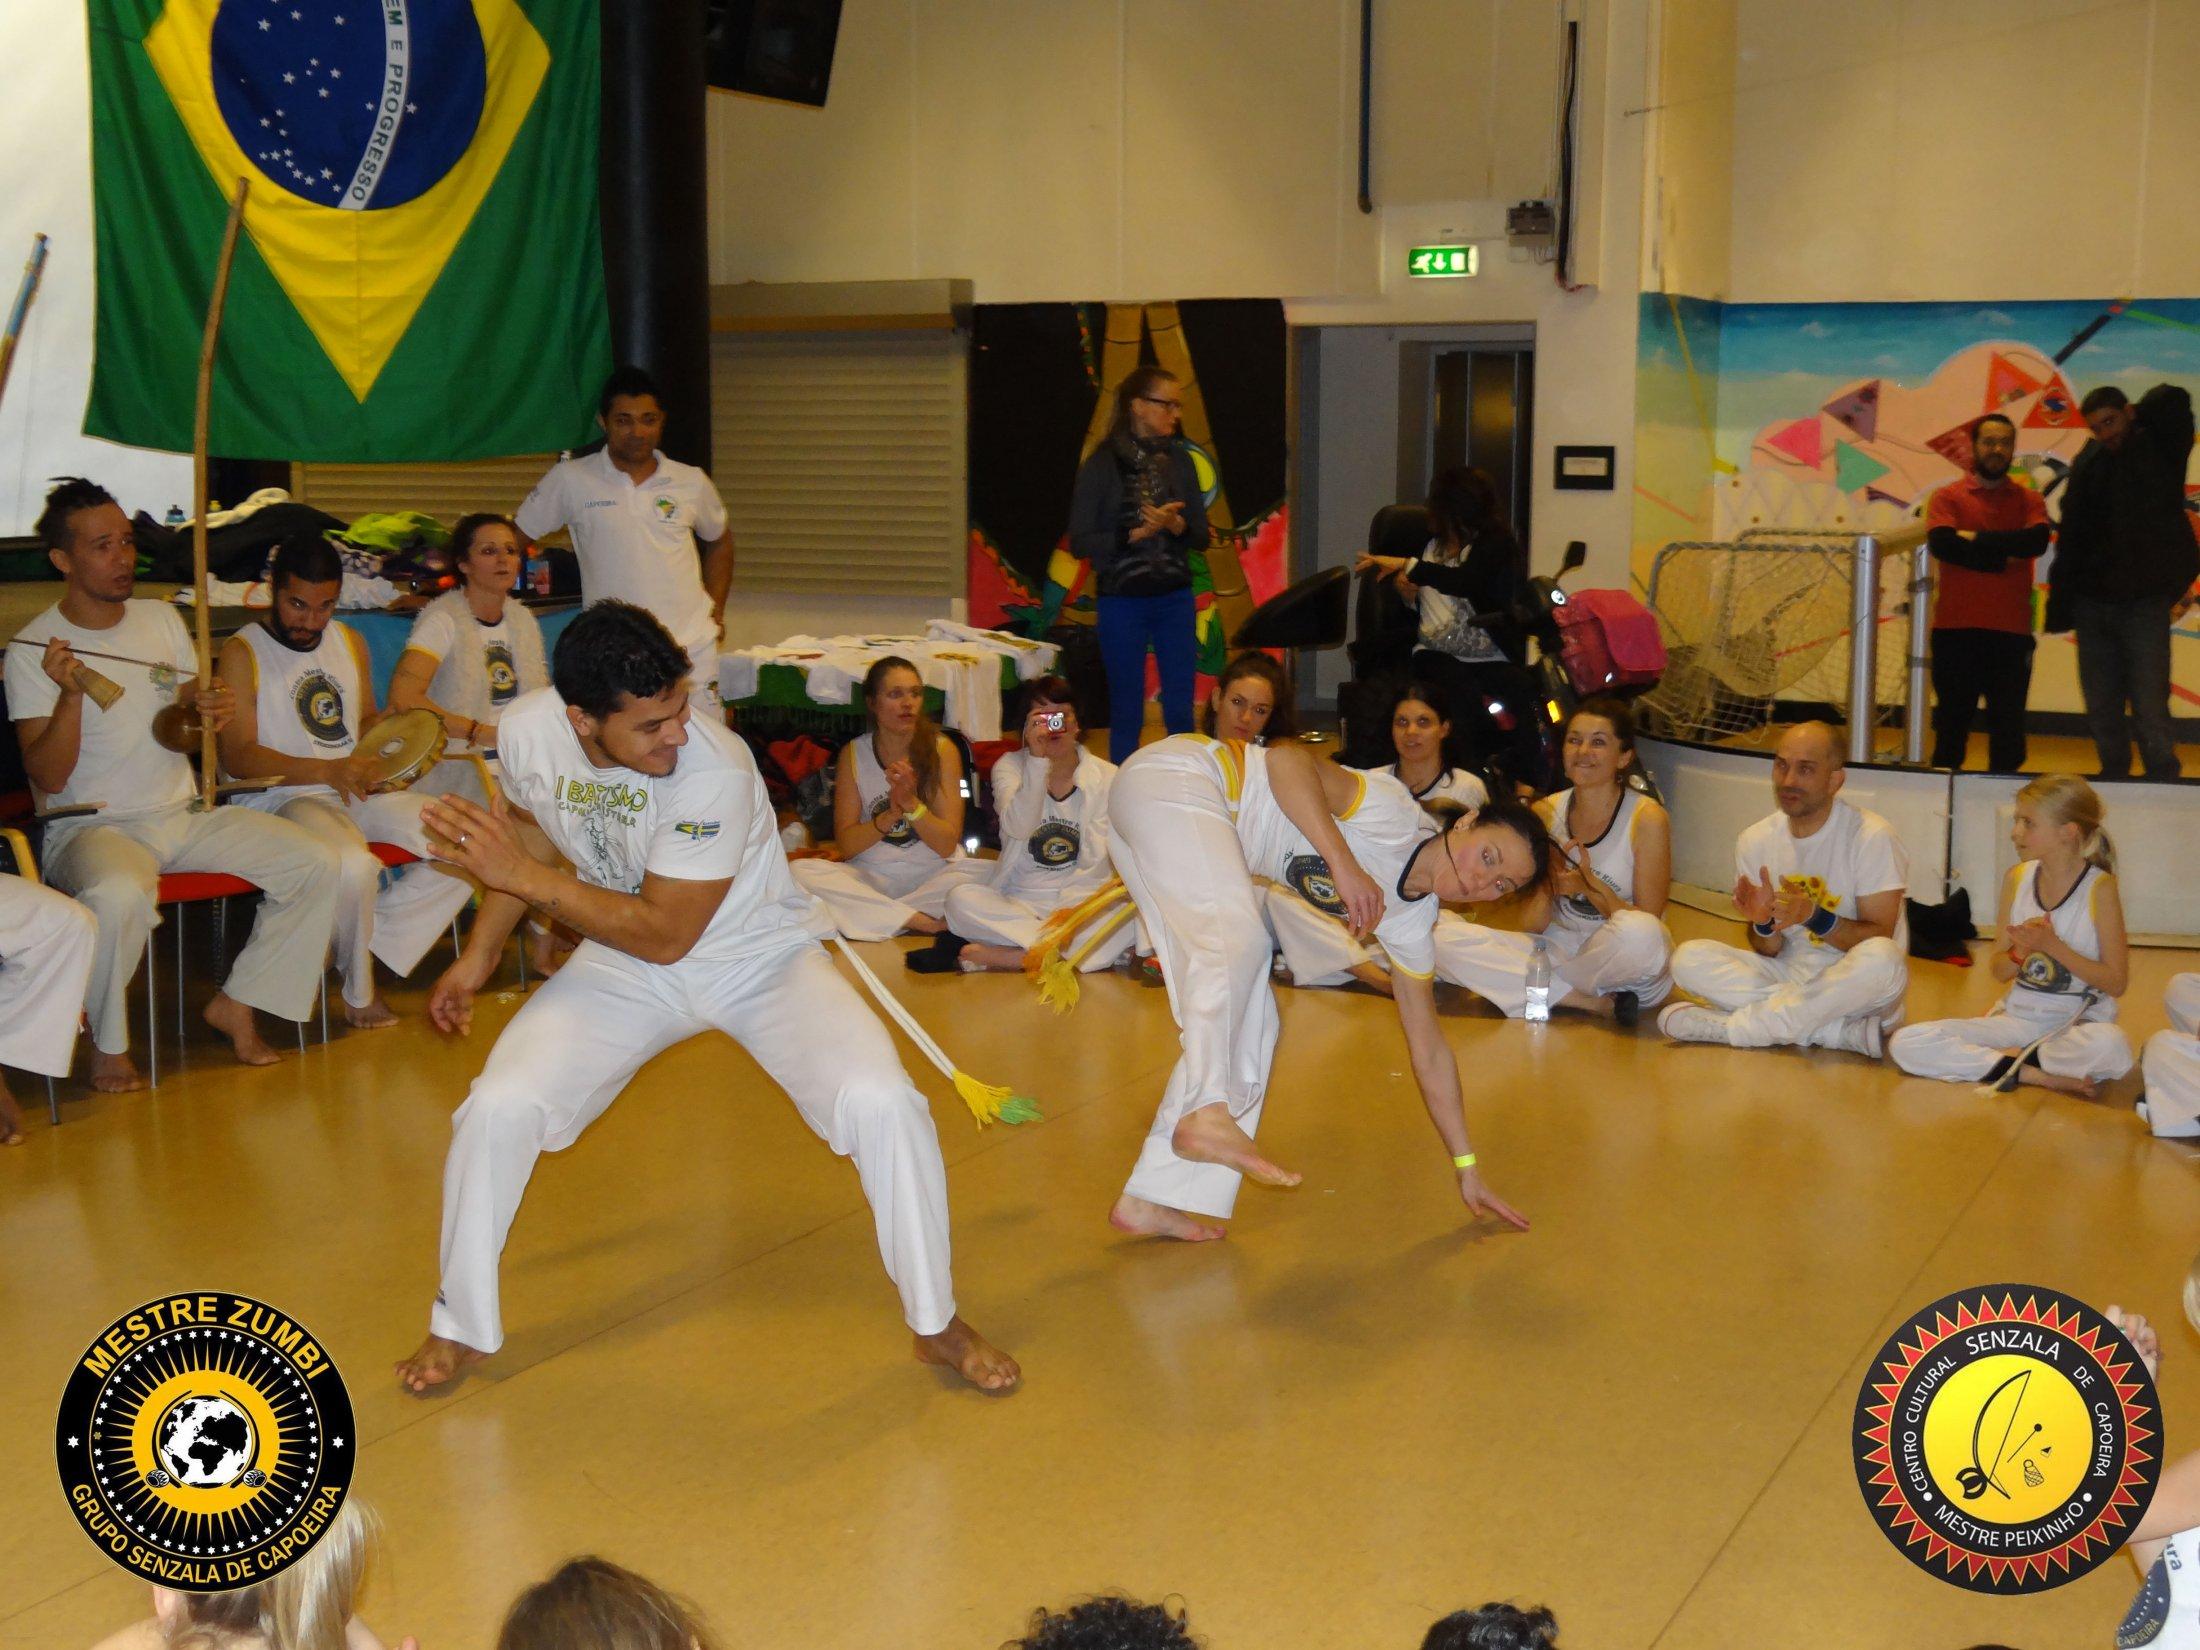 2013-12-14 - Capoeira 101